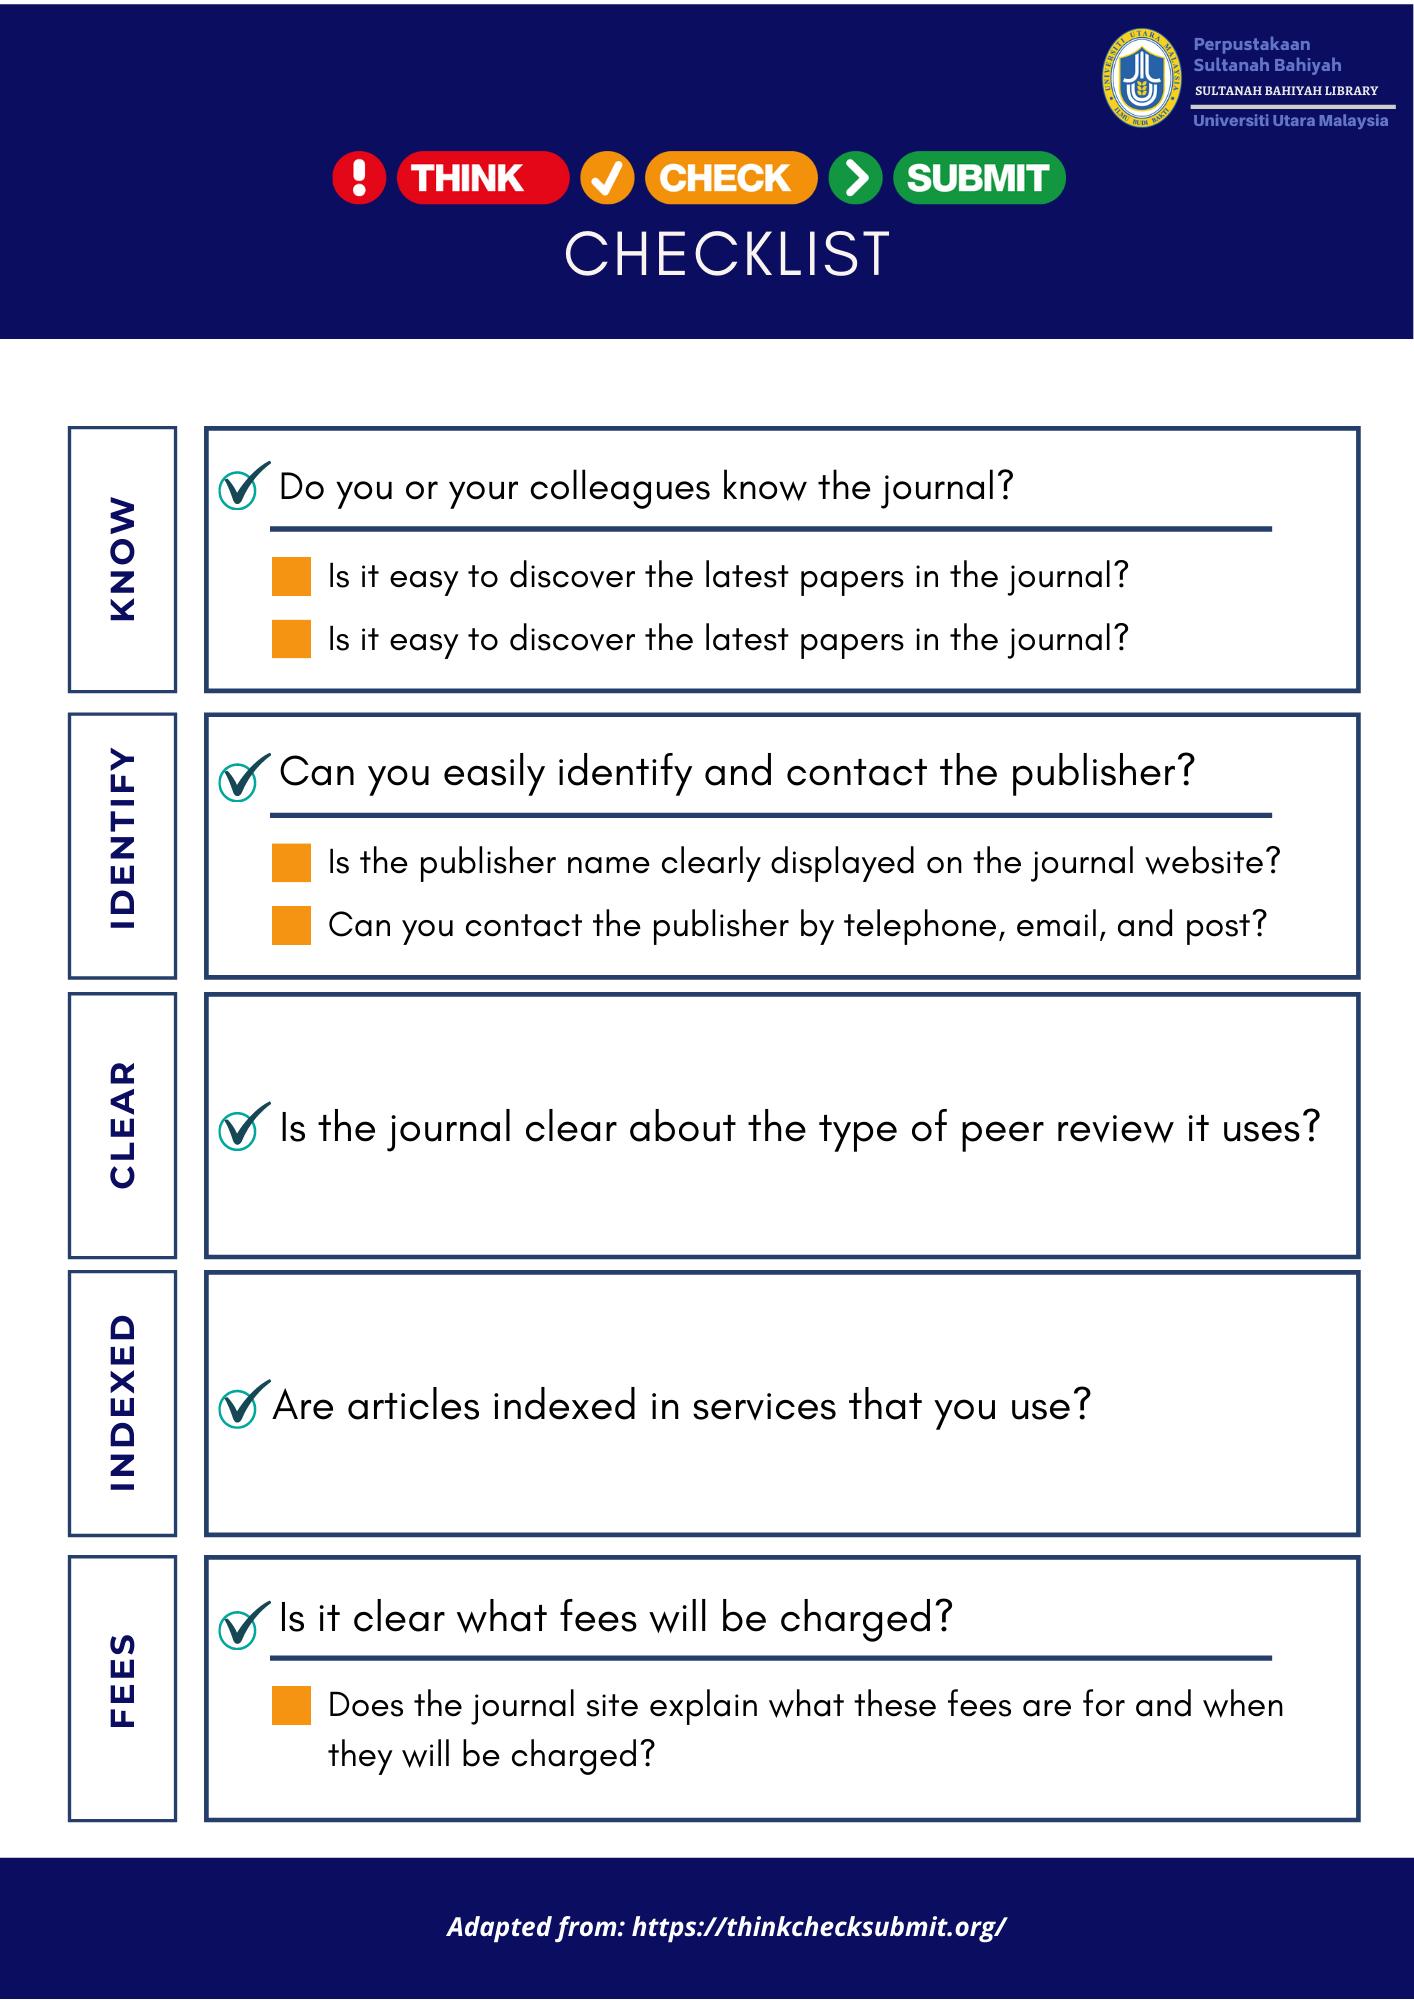 Checklist page 1